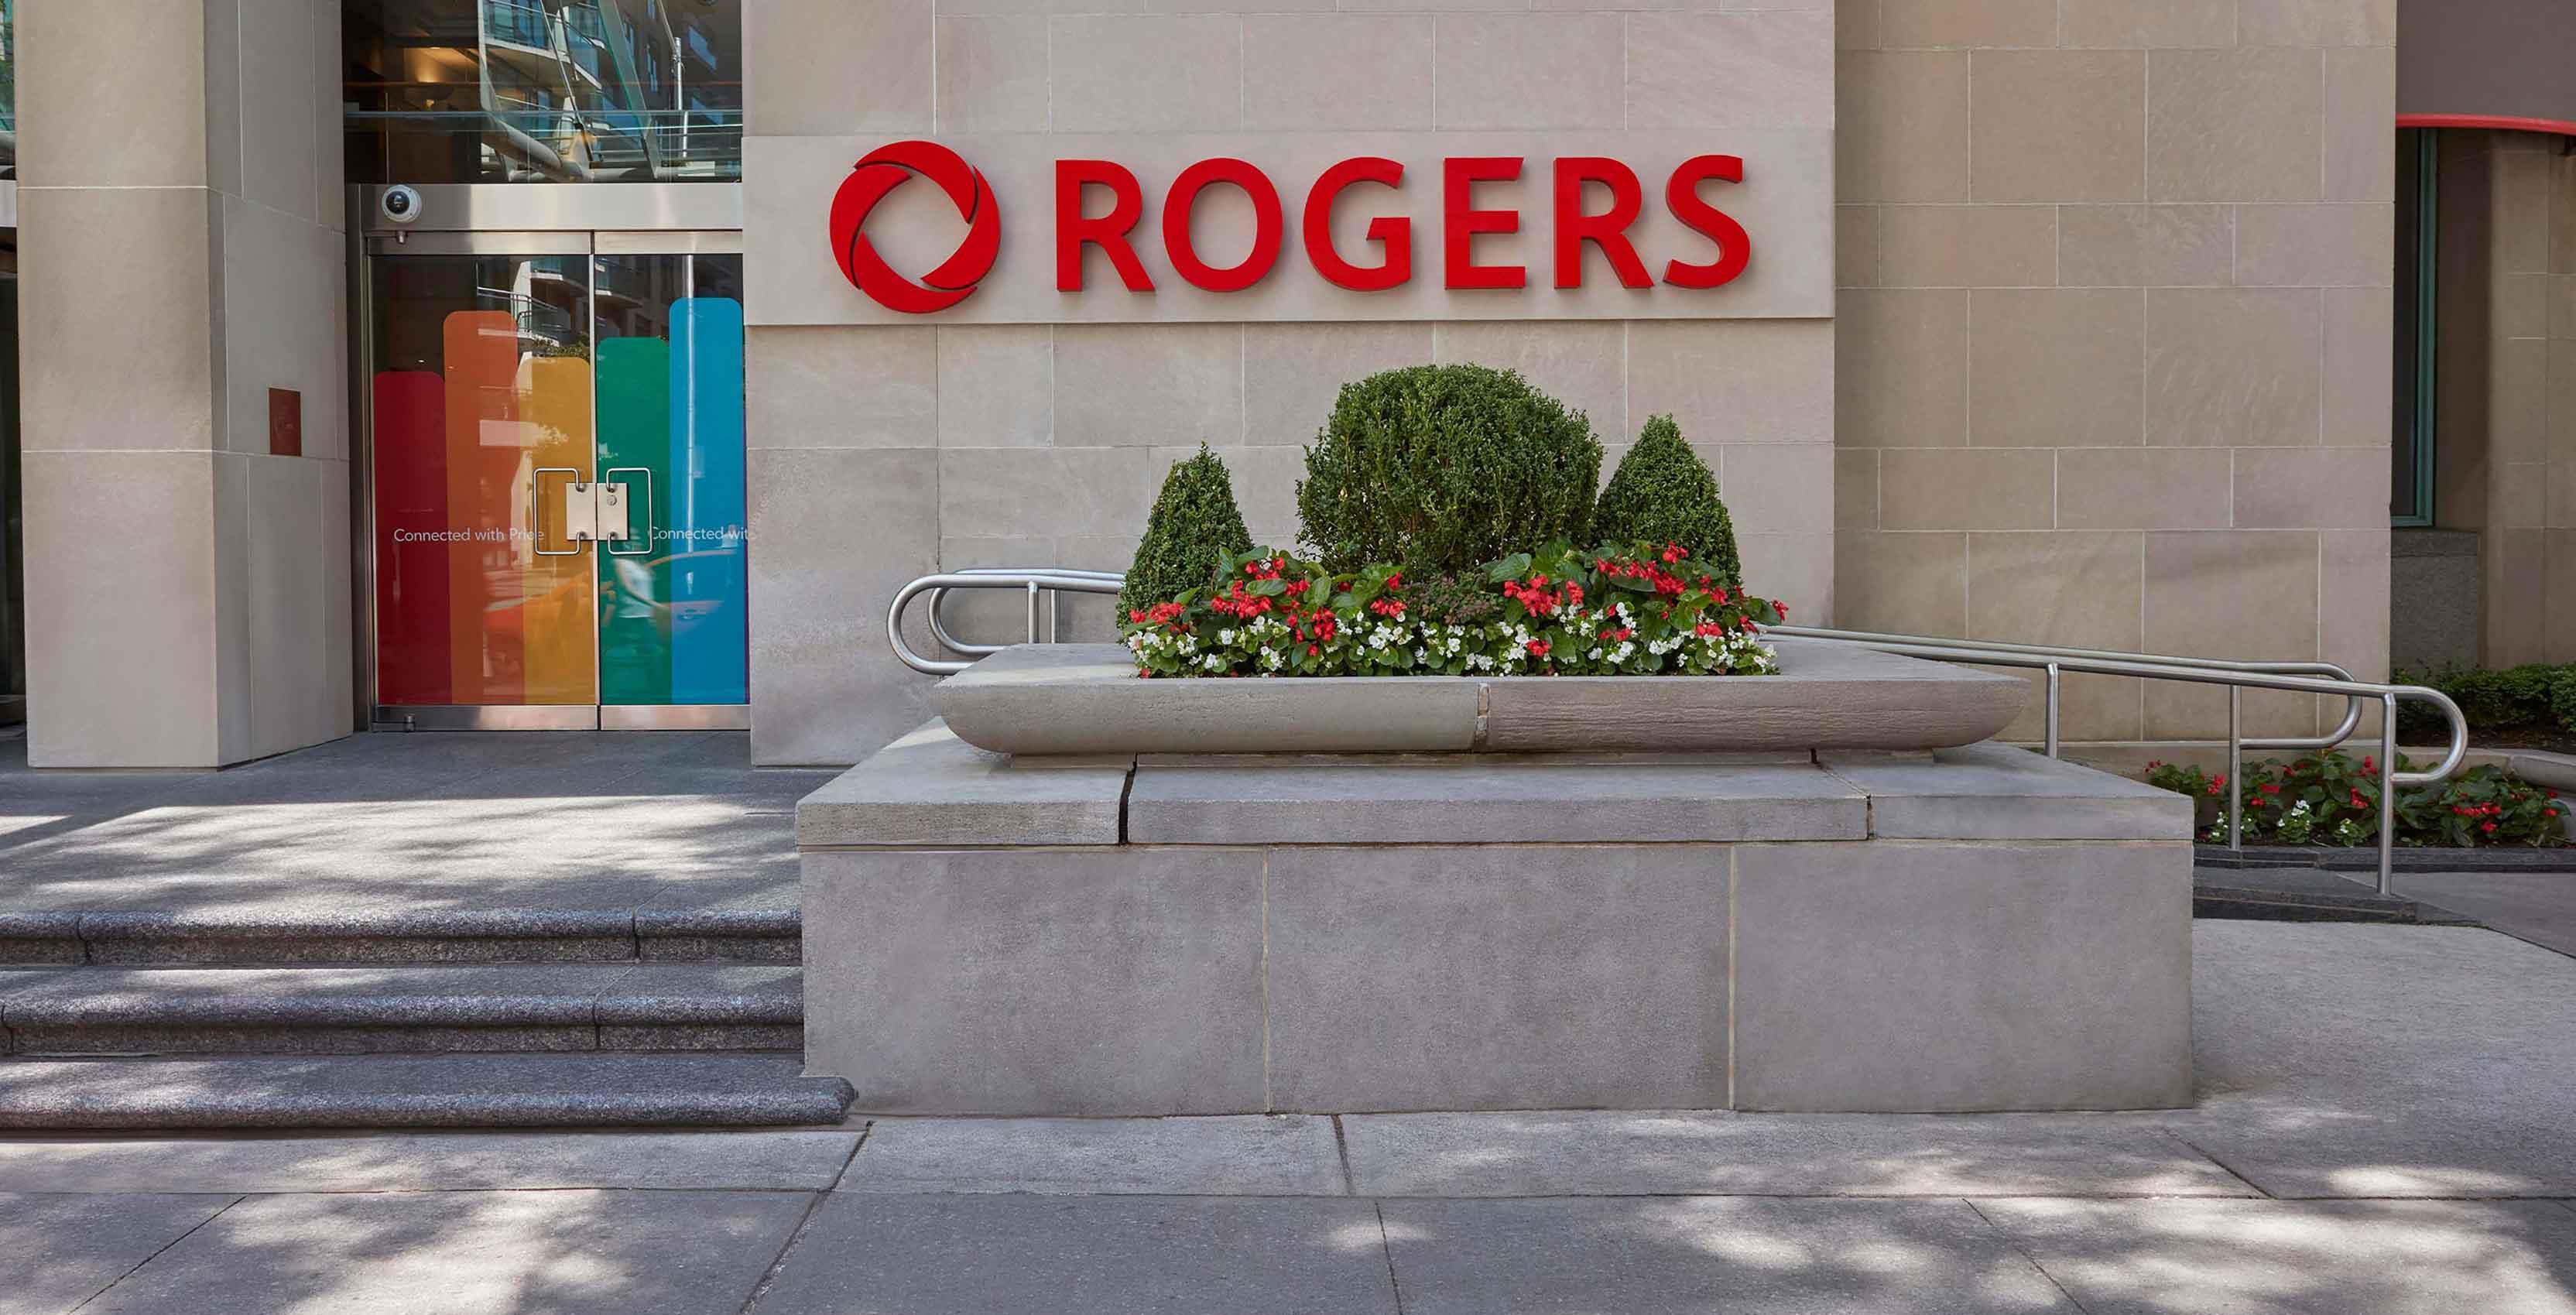 Rogers Header logo